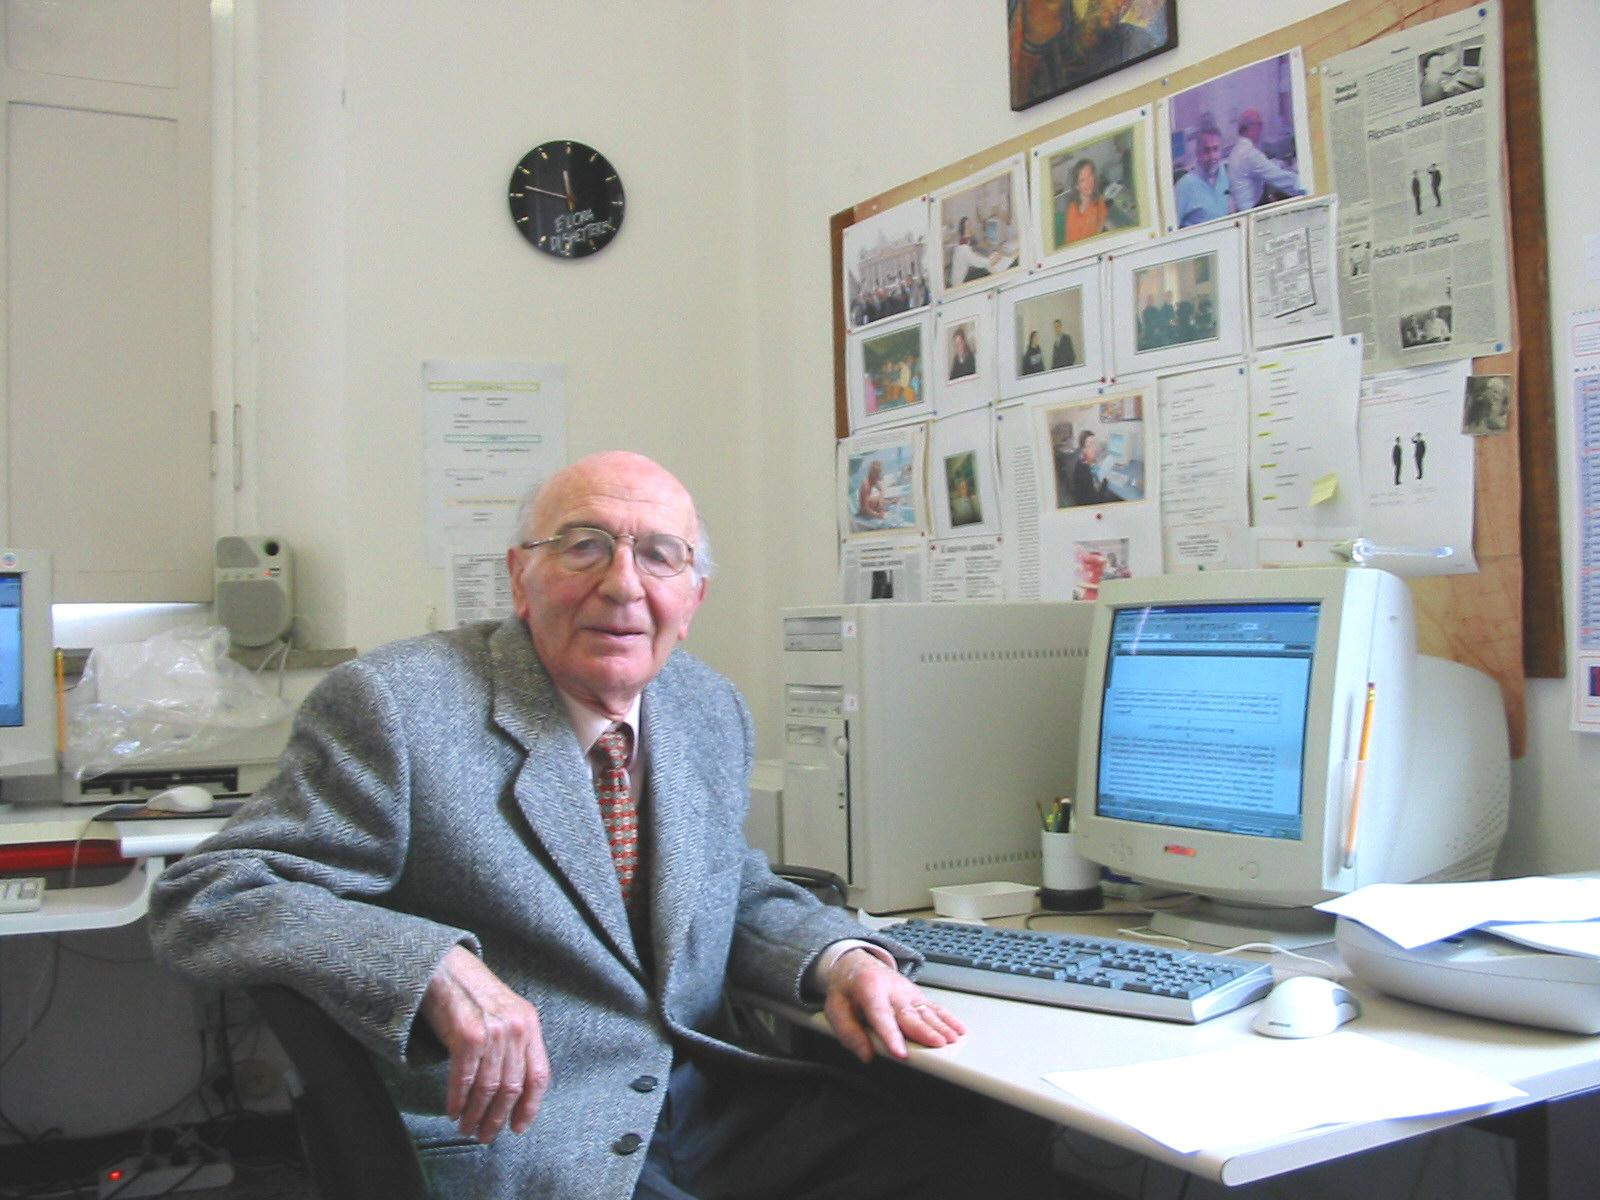 Aldo Deli